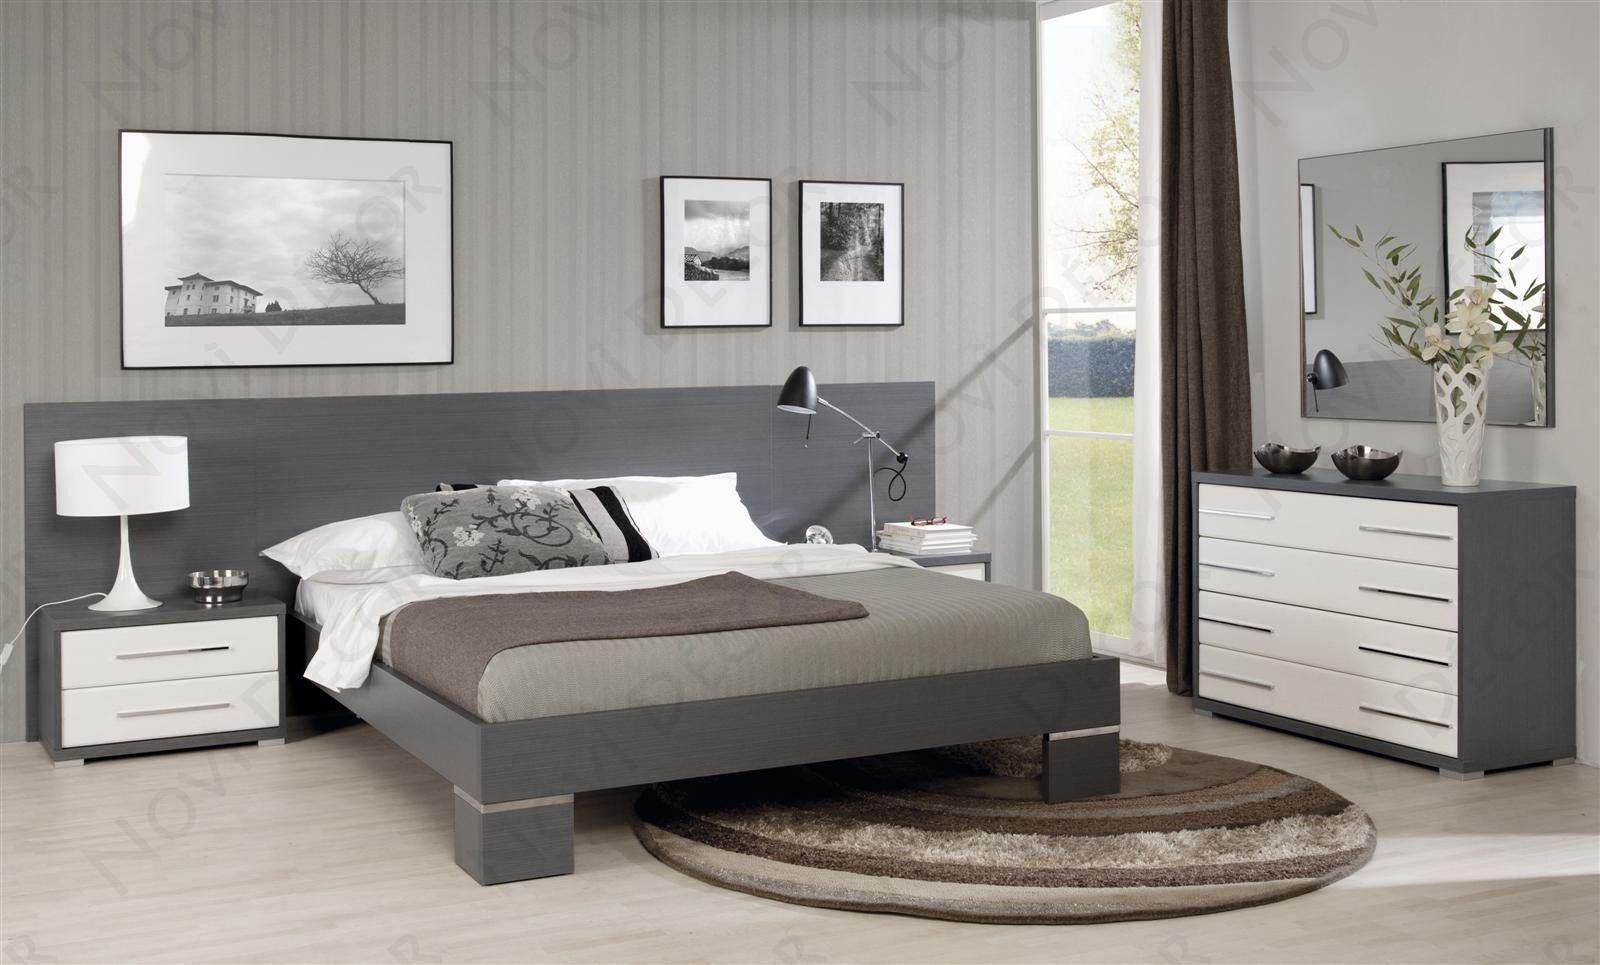 13+ Grey bedroom furniture ideas in 2021